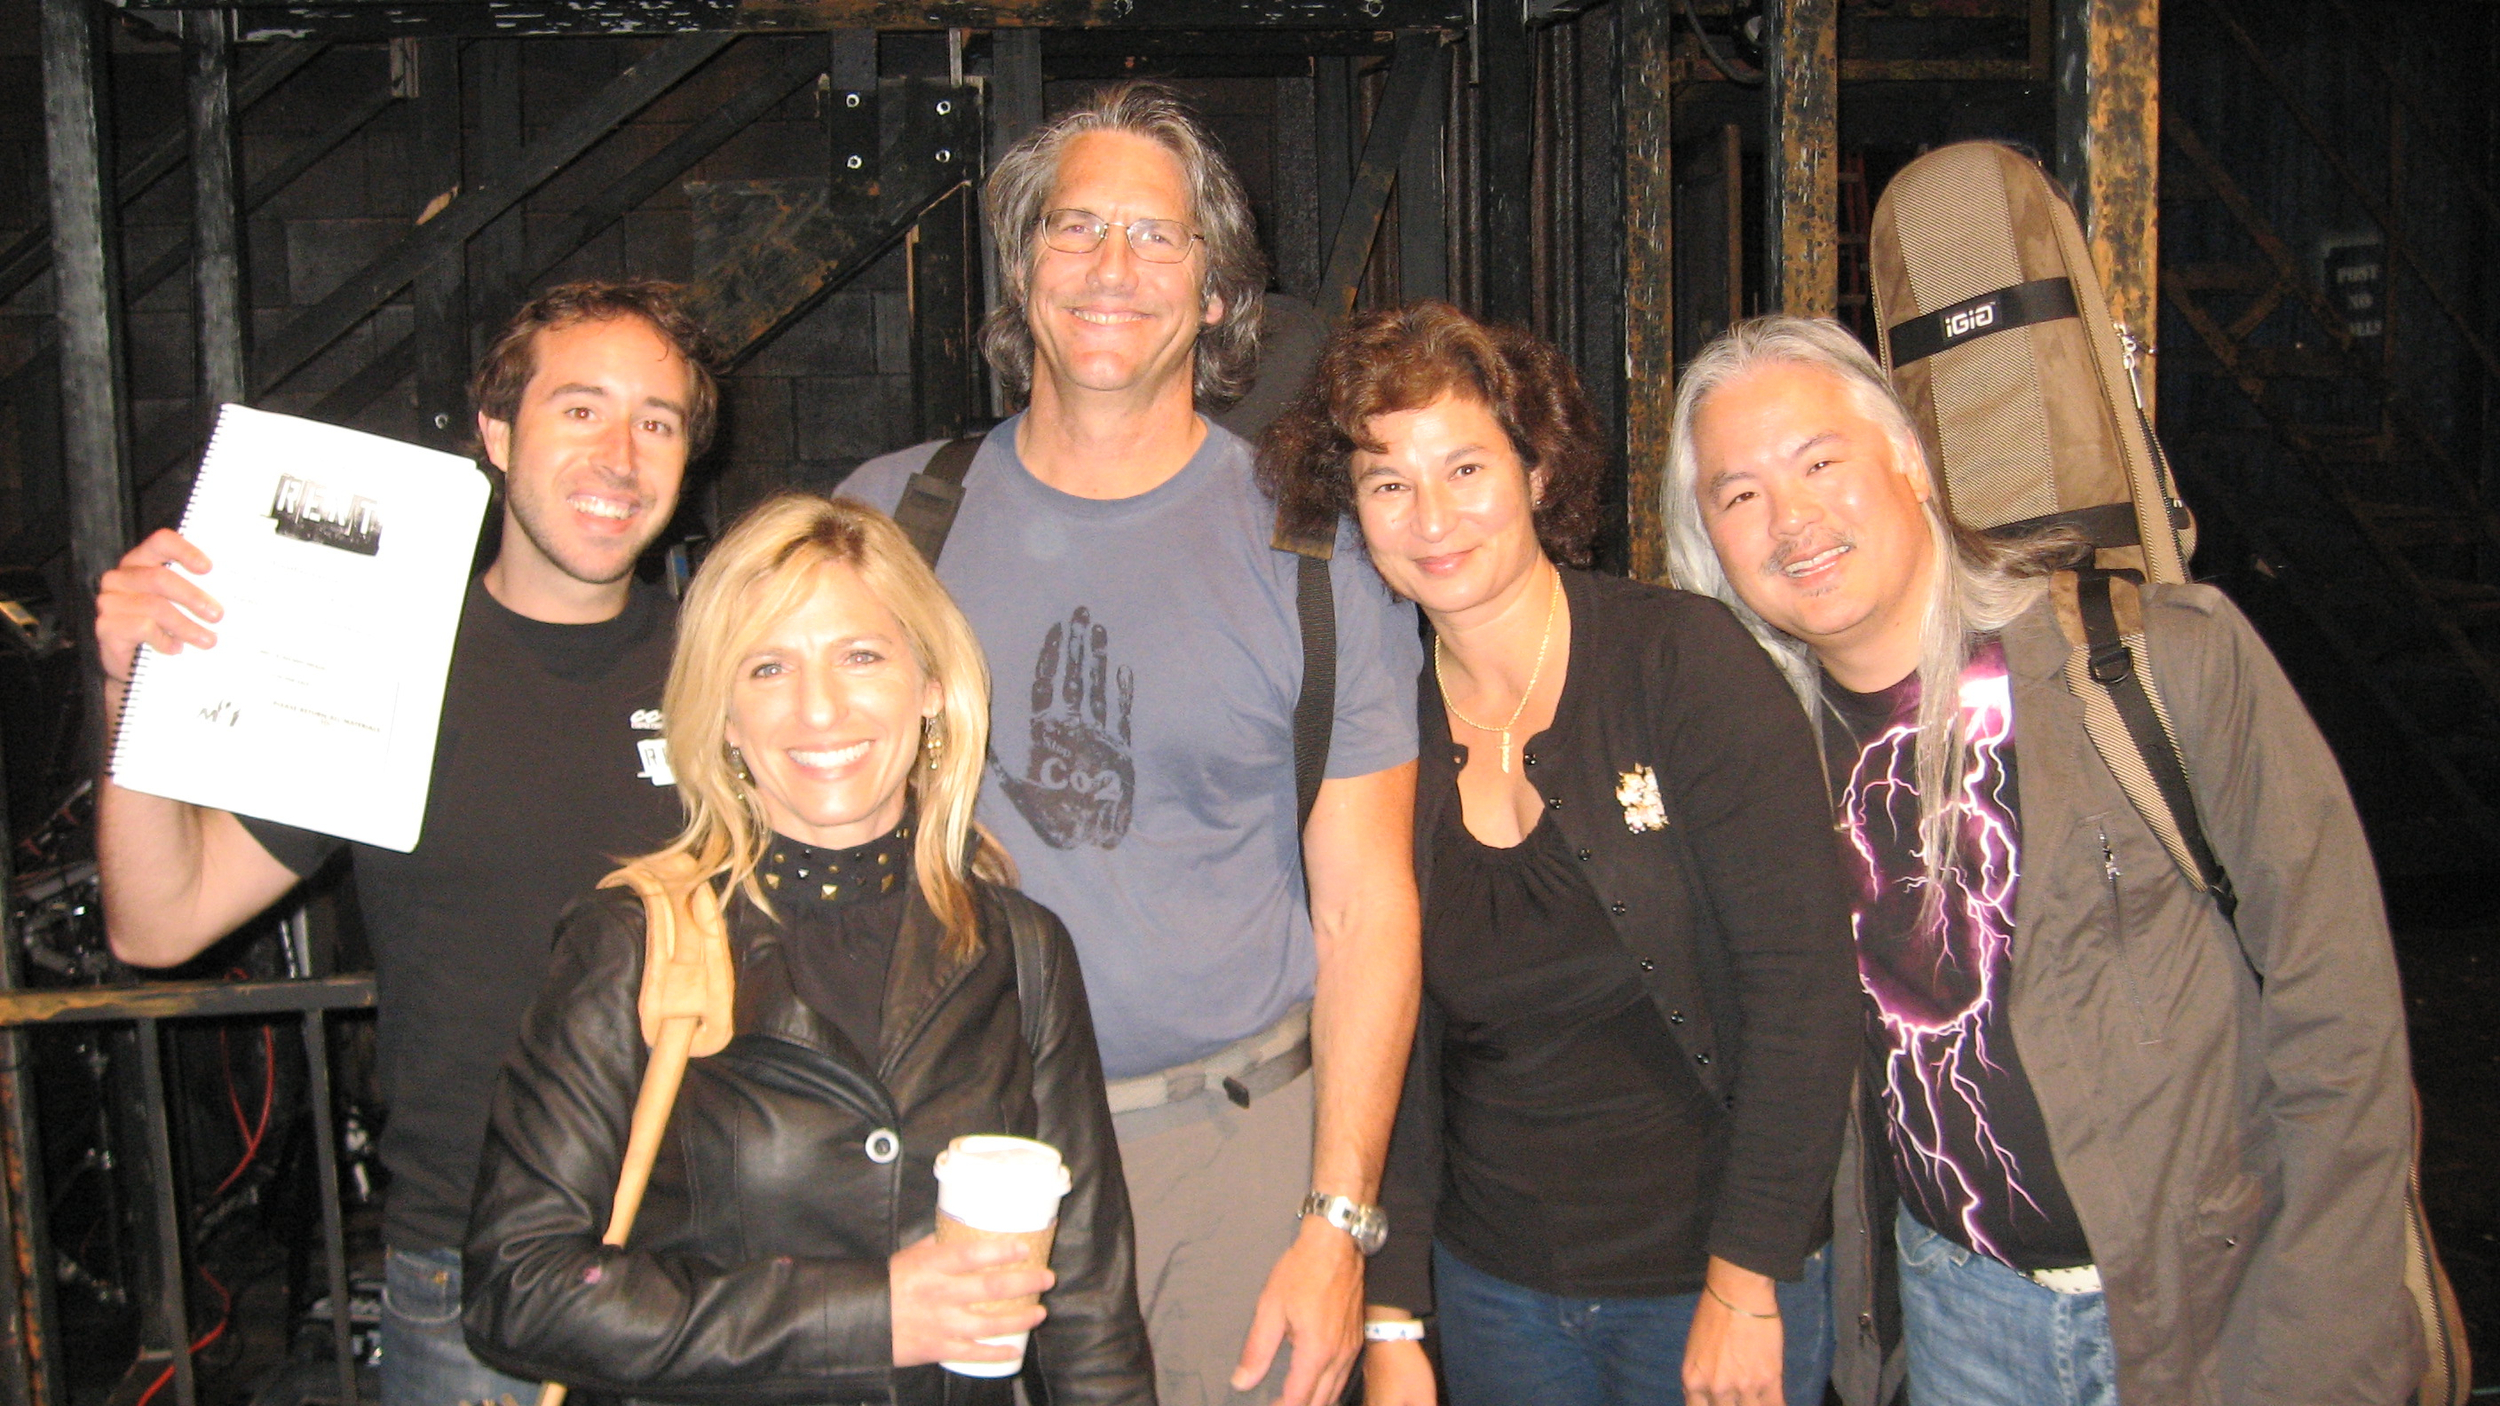 The RENT pit band - Lesher Center. Matt Smart, Kelly Fasman, John Imholz, Joan Cifarelli, Danny Min